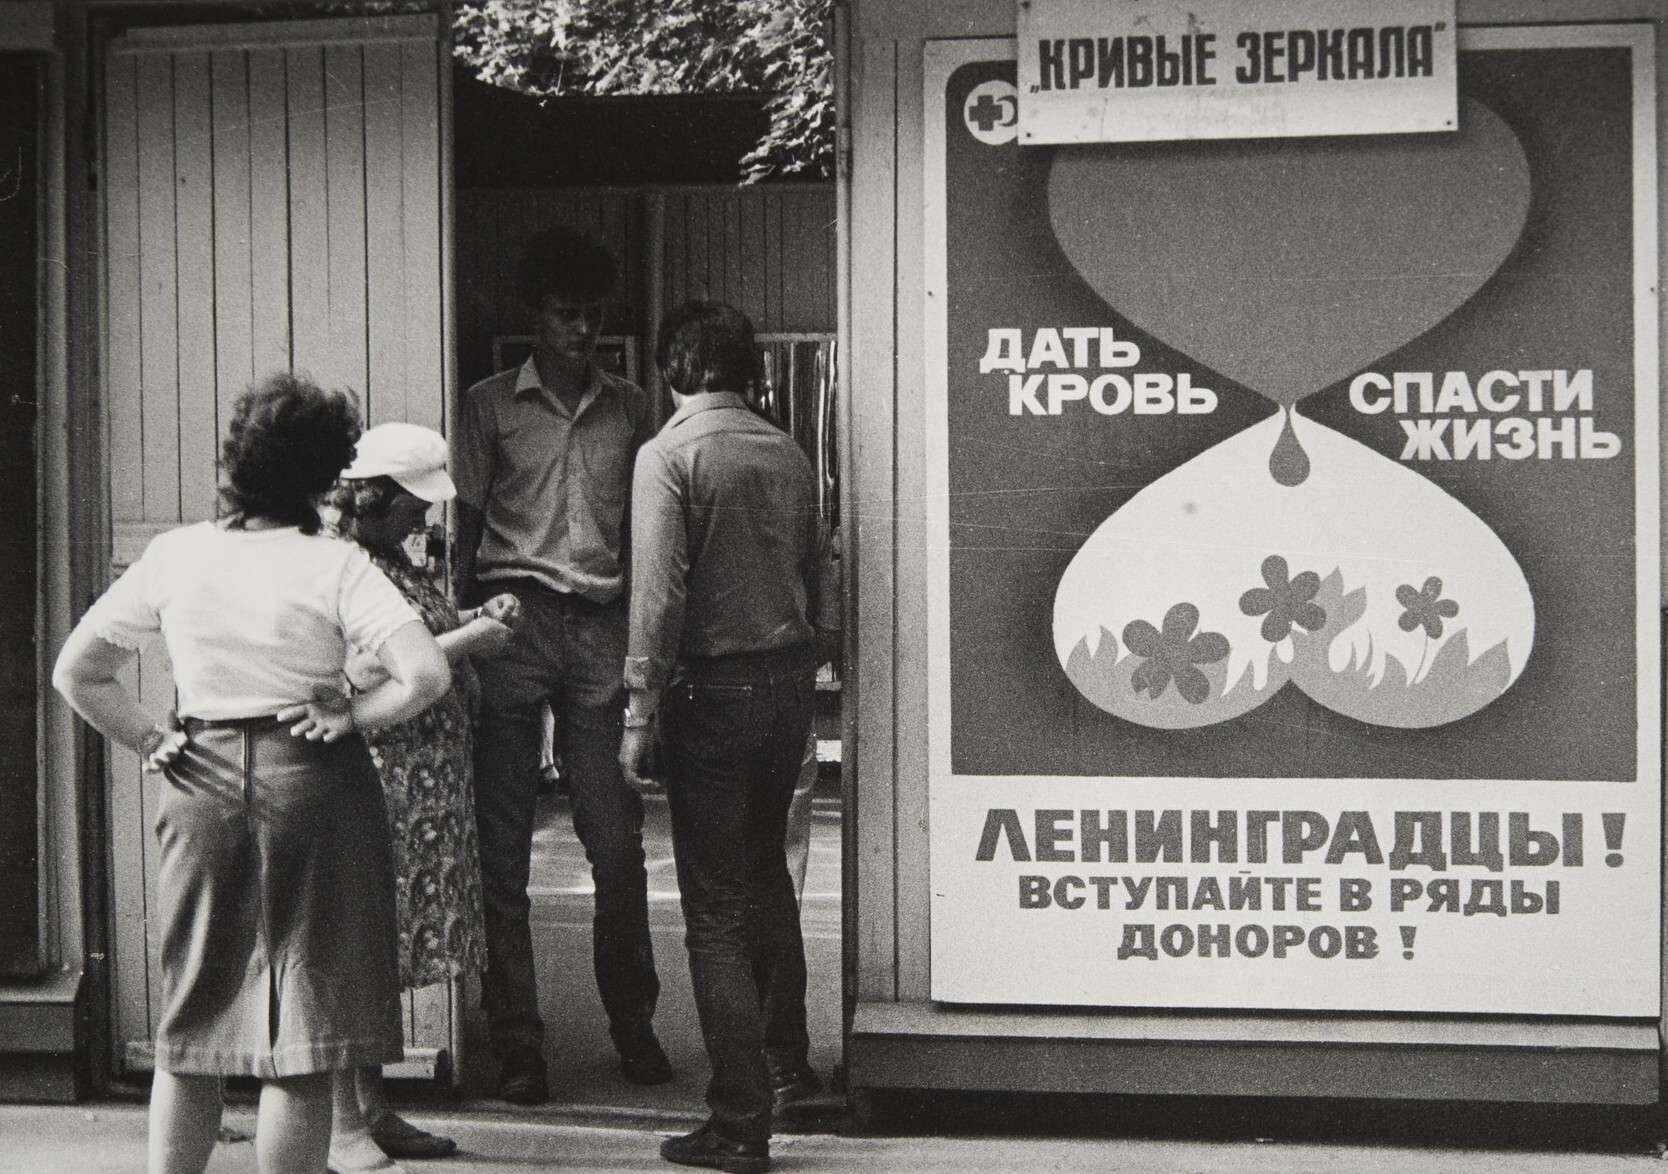 Сергей Королев.    Без названия   Ленинград, 1980‑е